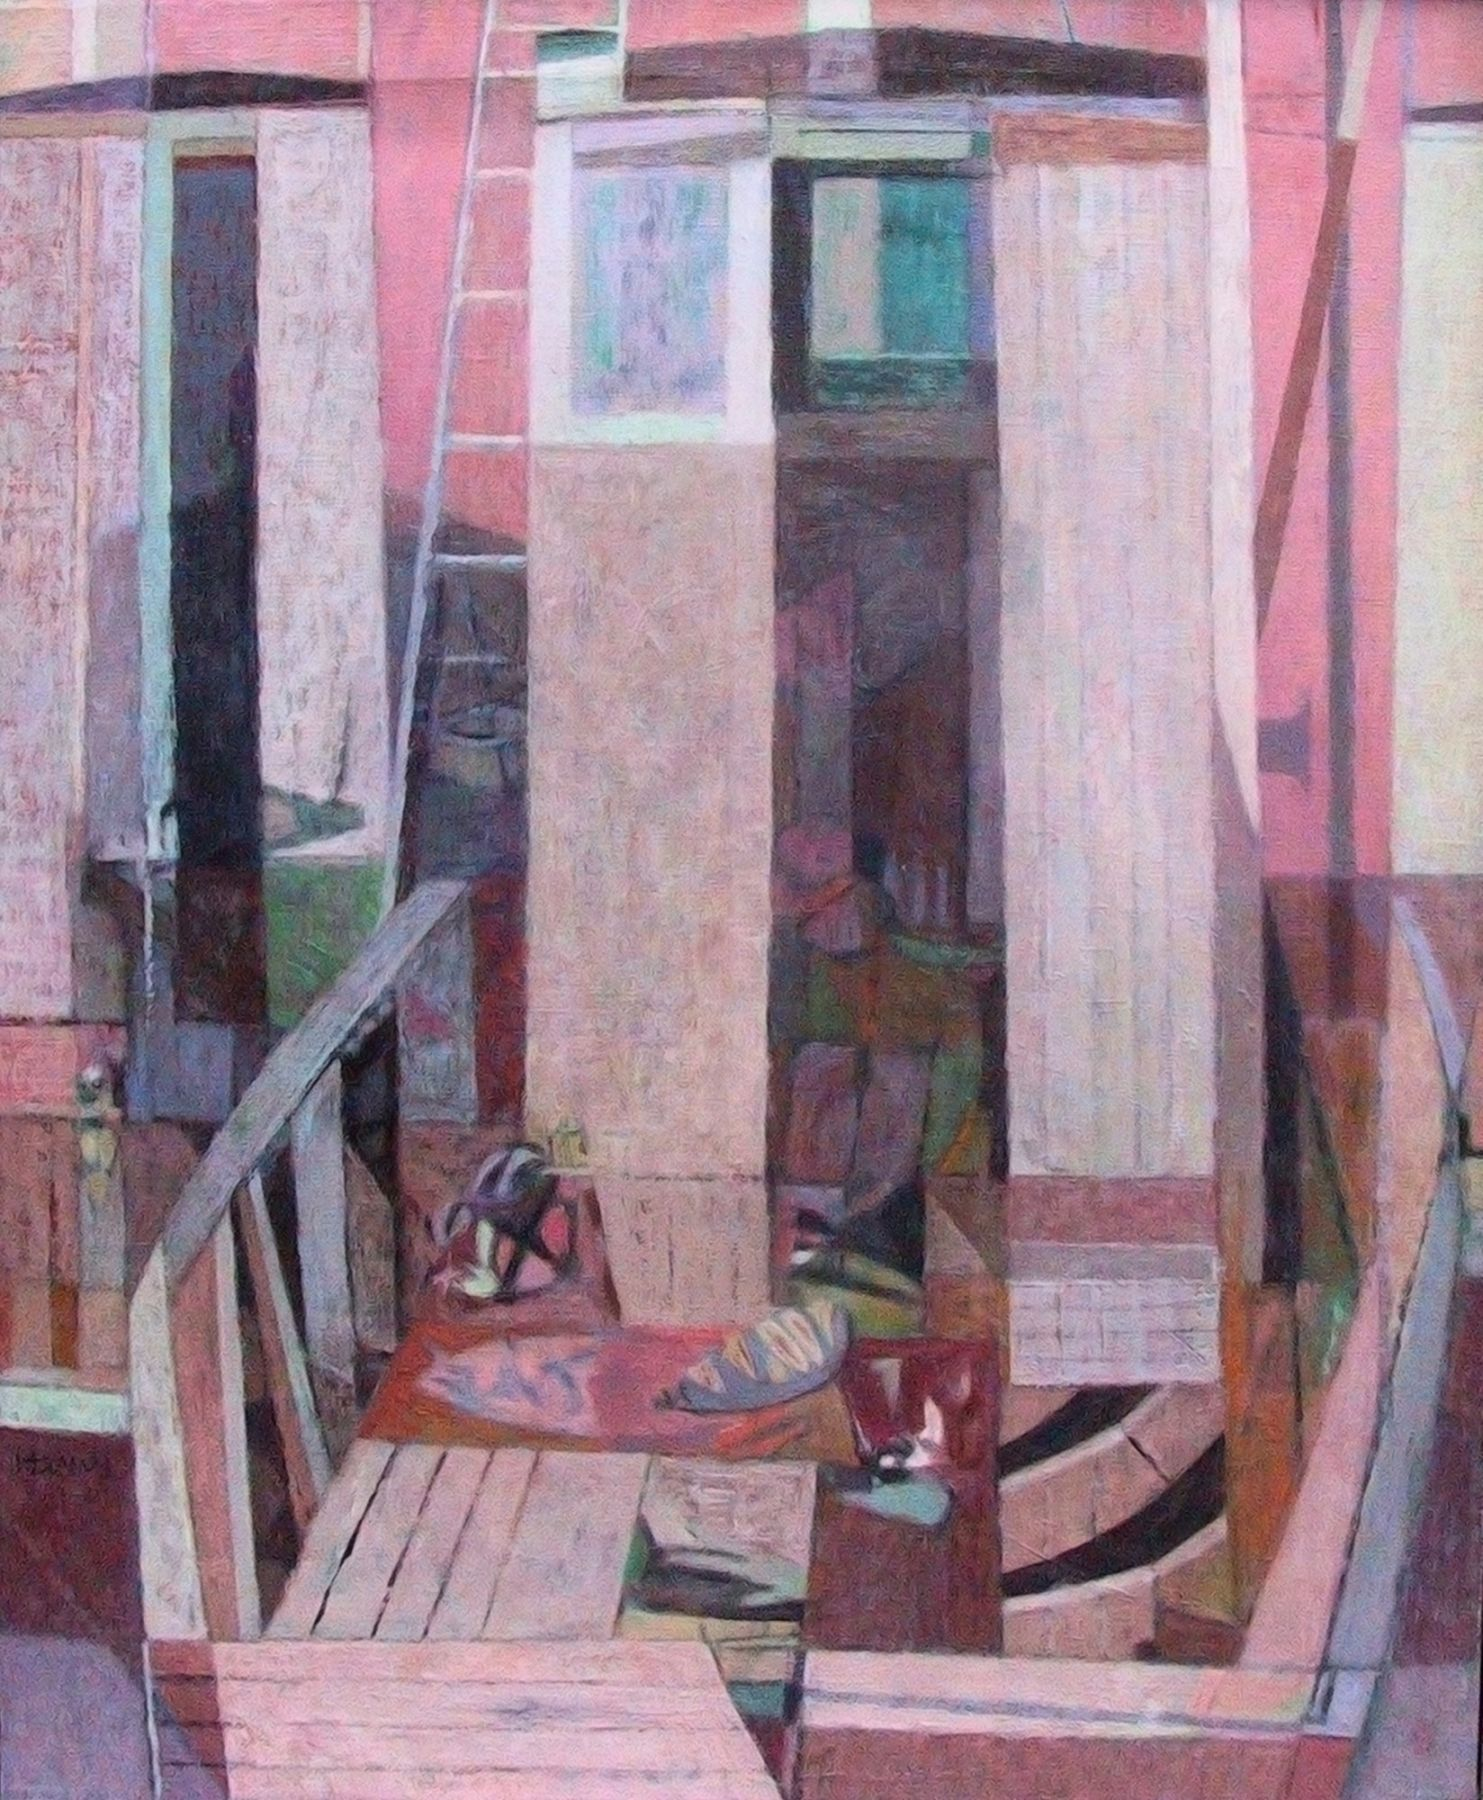 Richard Haines (1906 - 1984) - Sea House Dry Dock